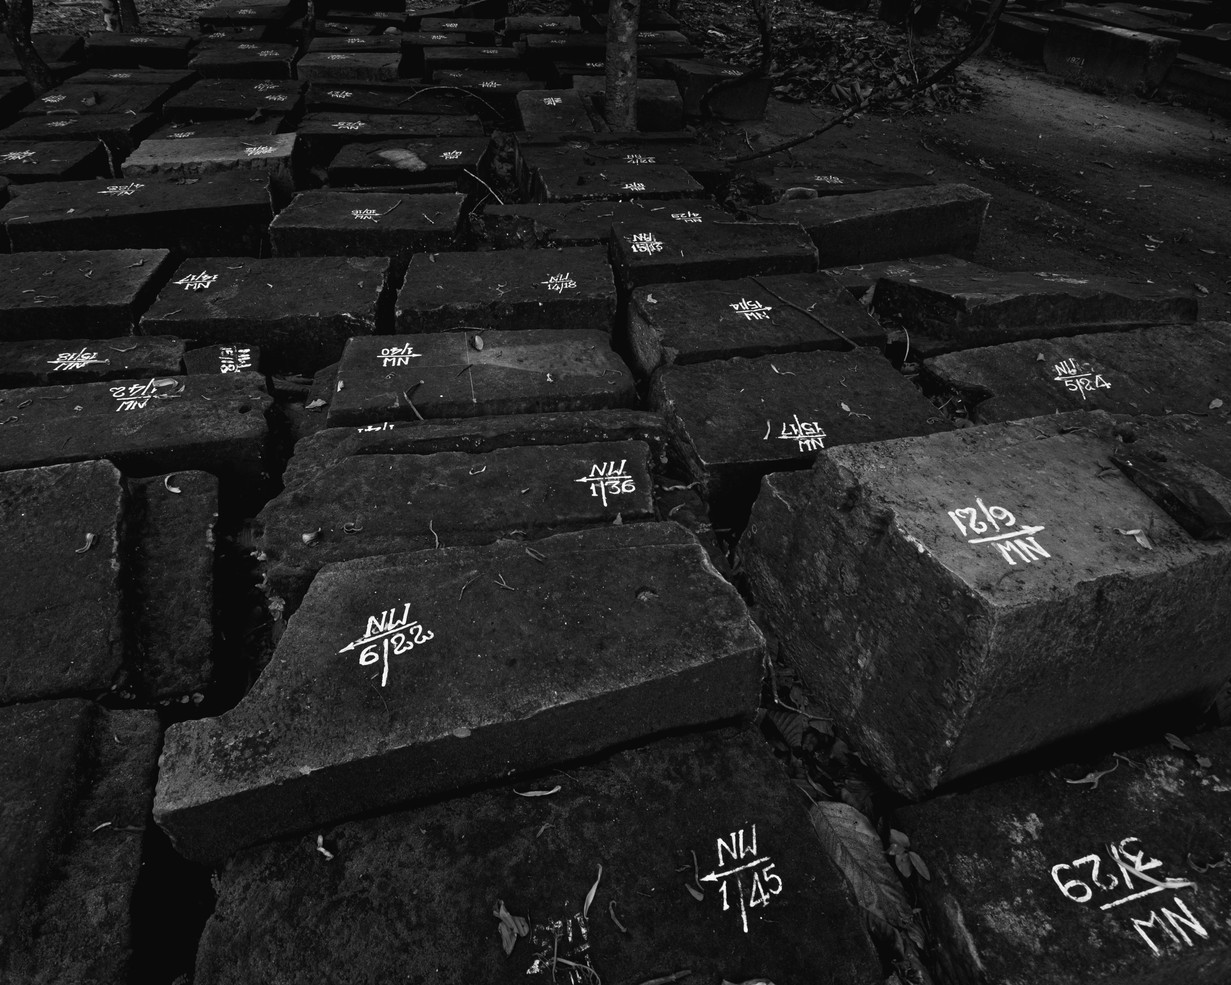 14_20120802_Cambodia SiemReap_1154.JPG